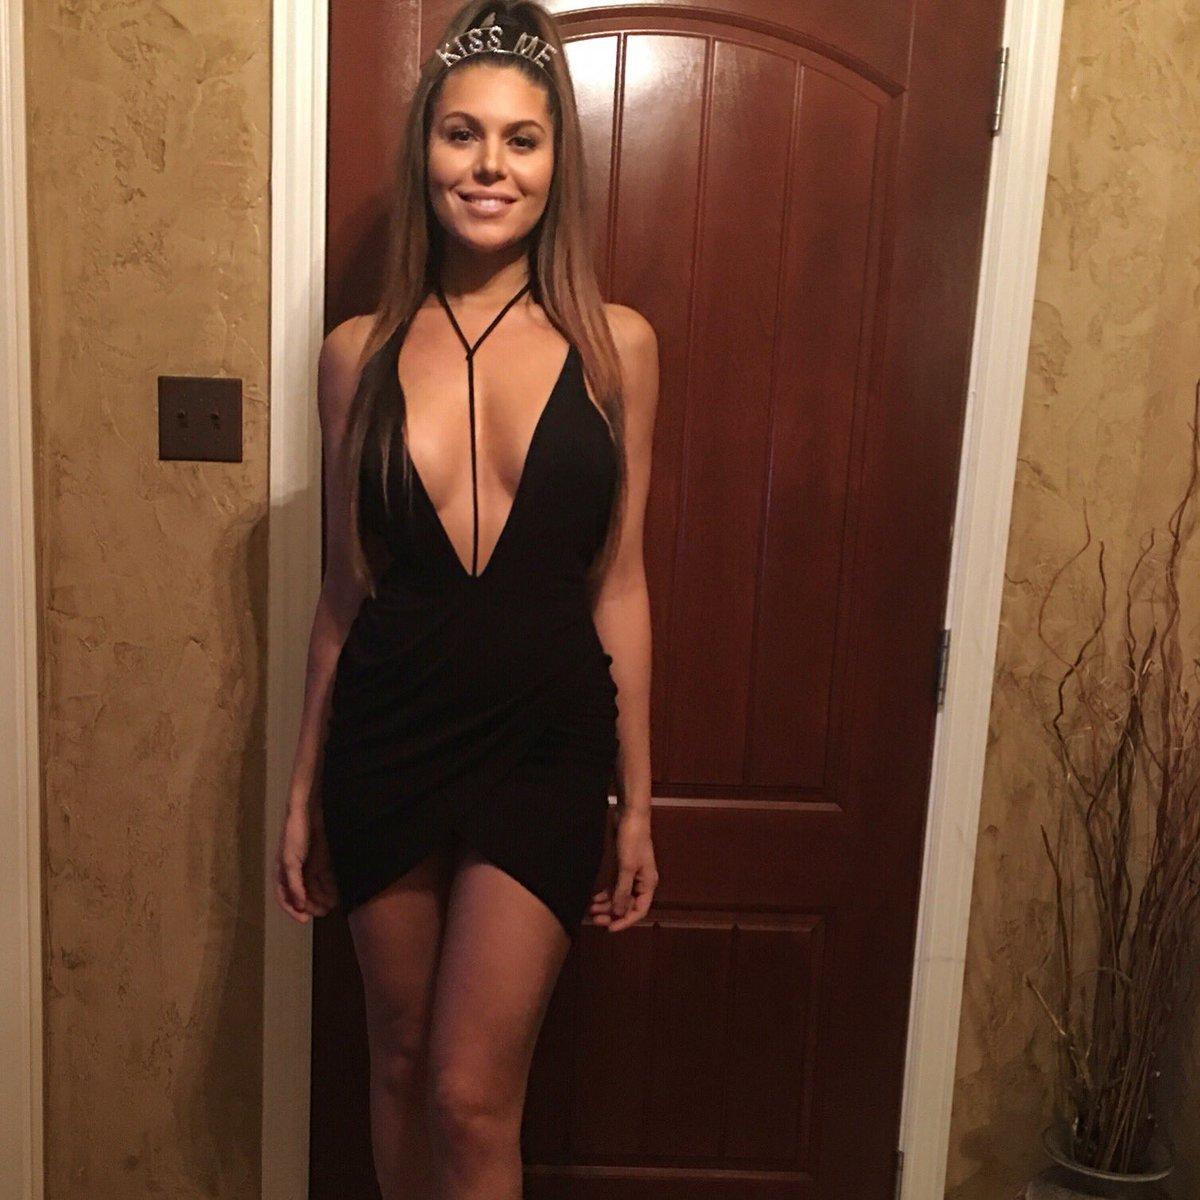 Twitter Terann Hilow nudes (17 photo), Tits, Sideboobs, Selfie, cameltoe 2020